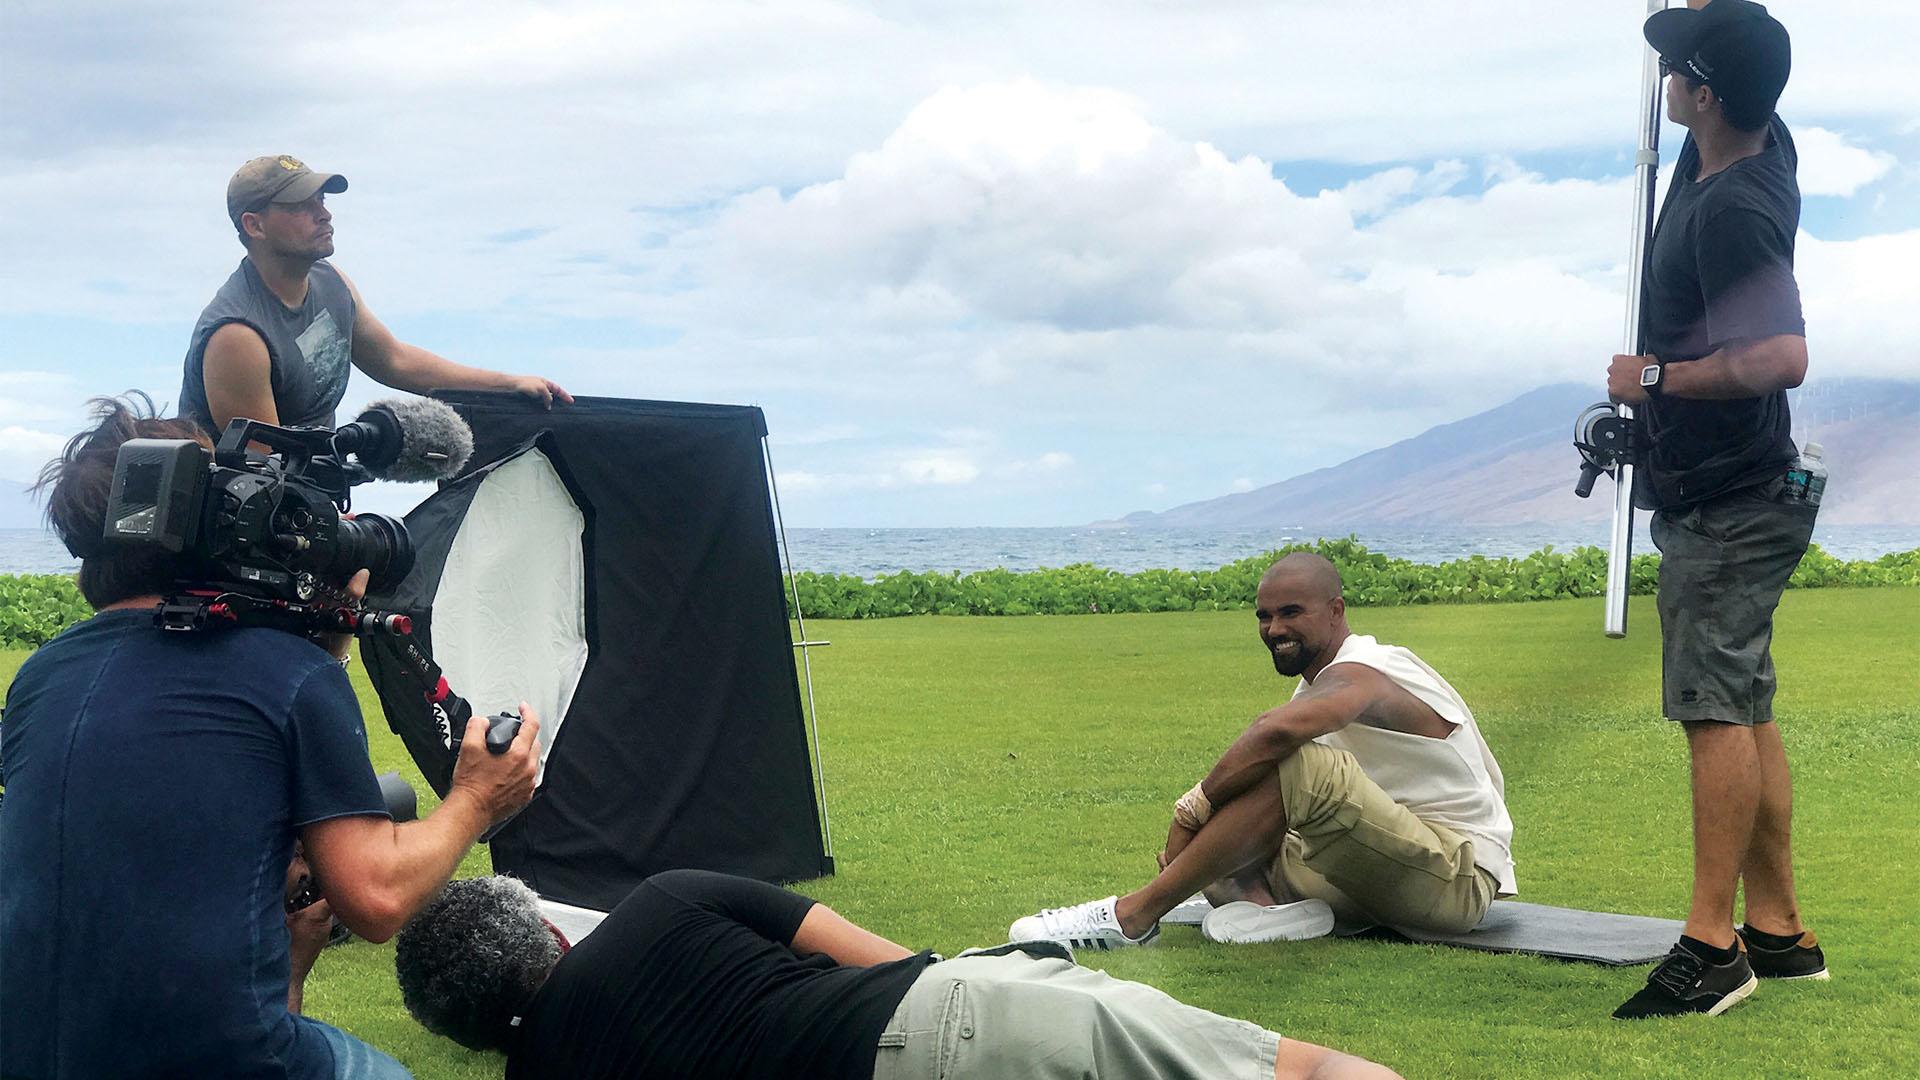 Making the Maui photo magic happen